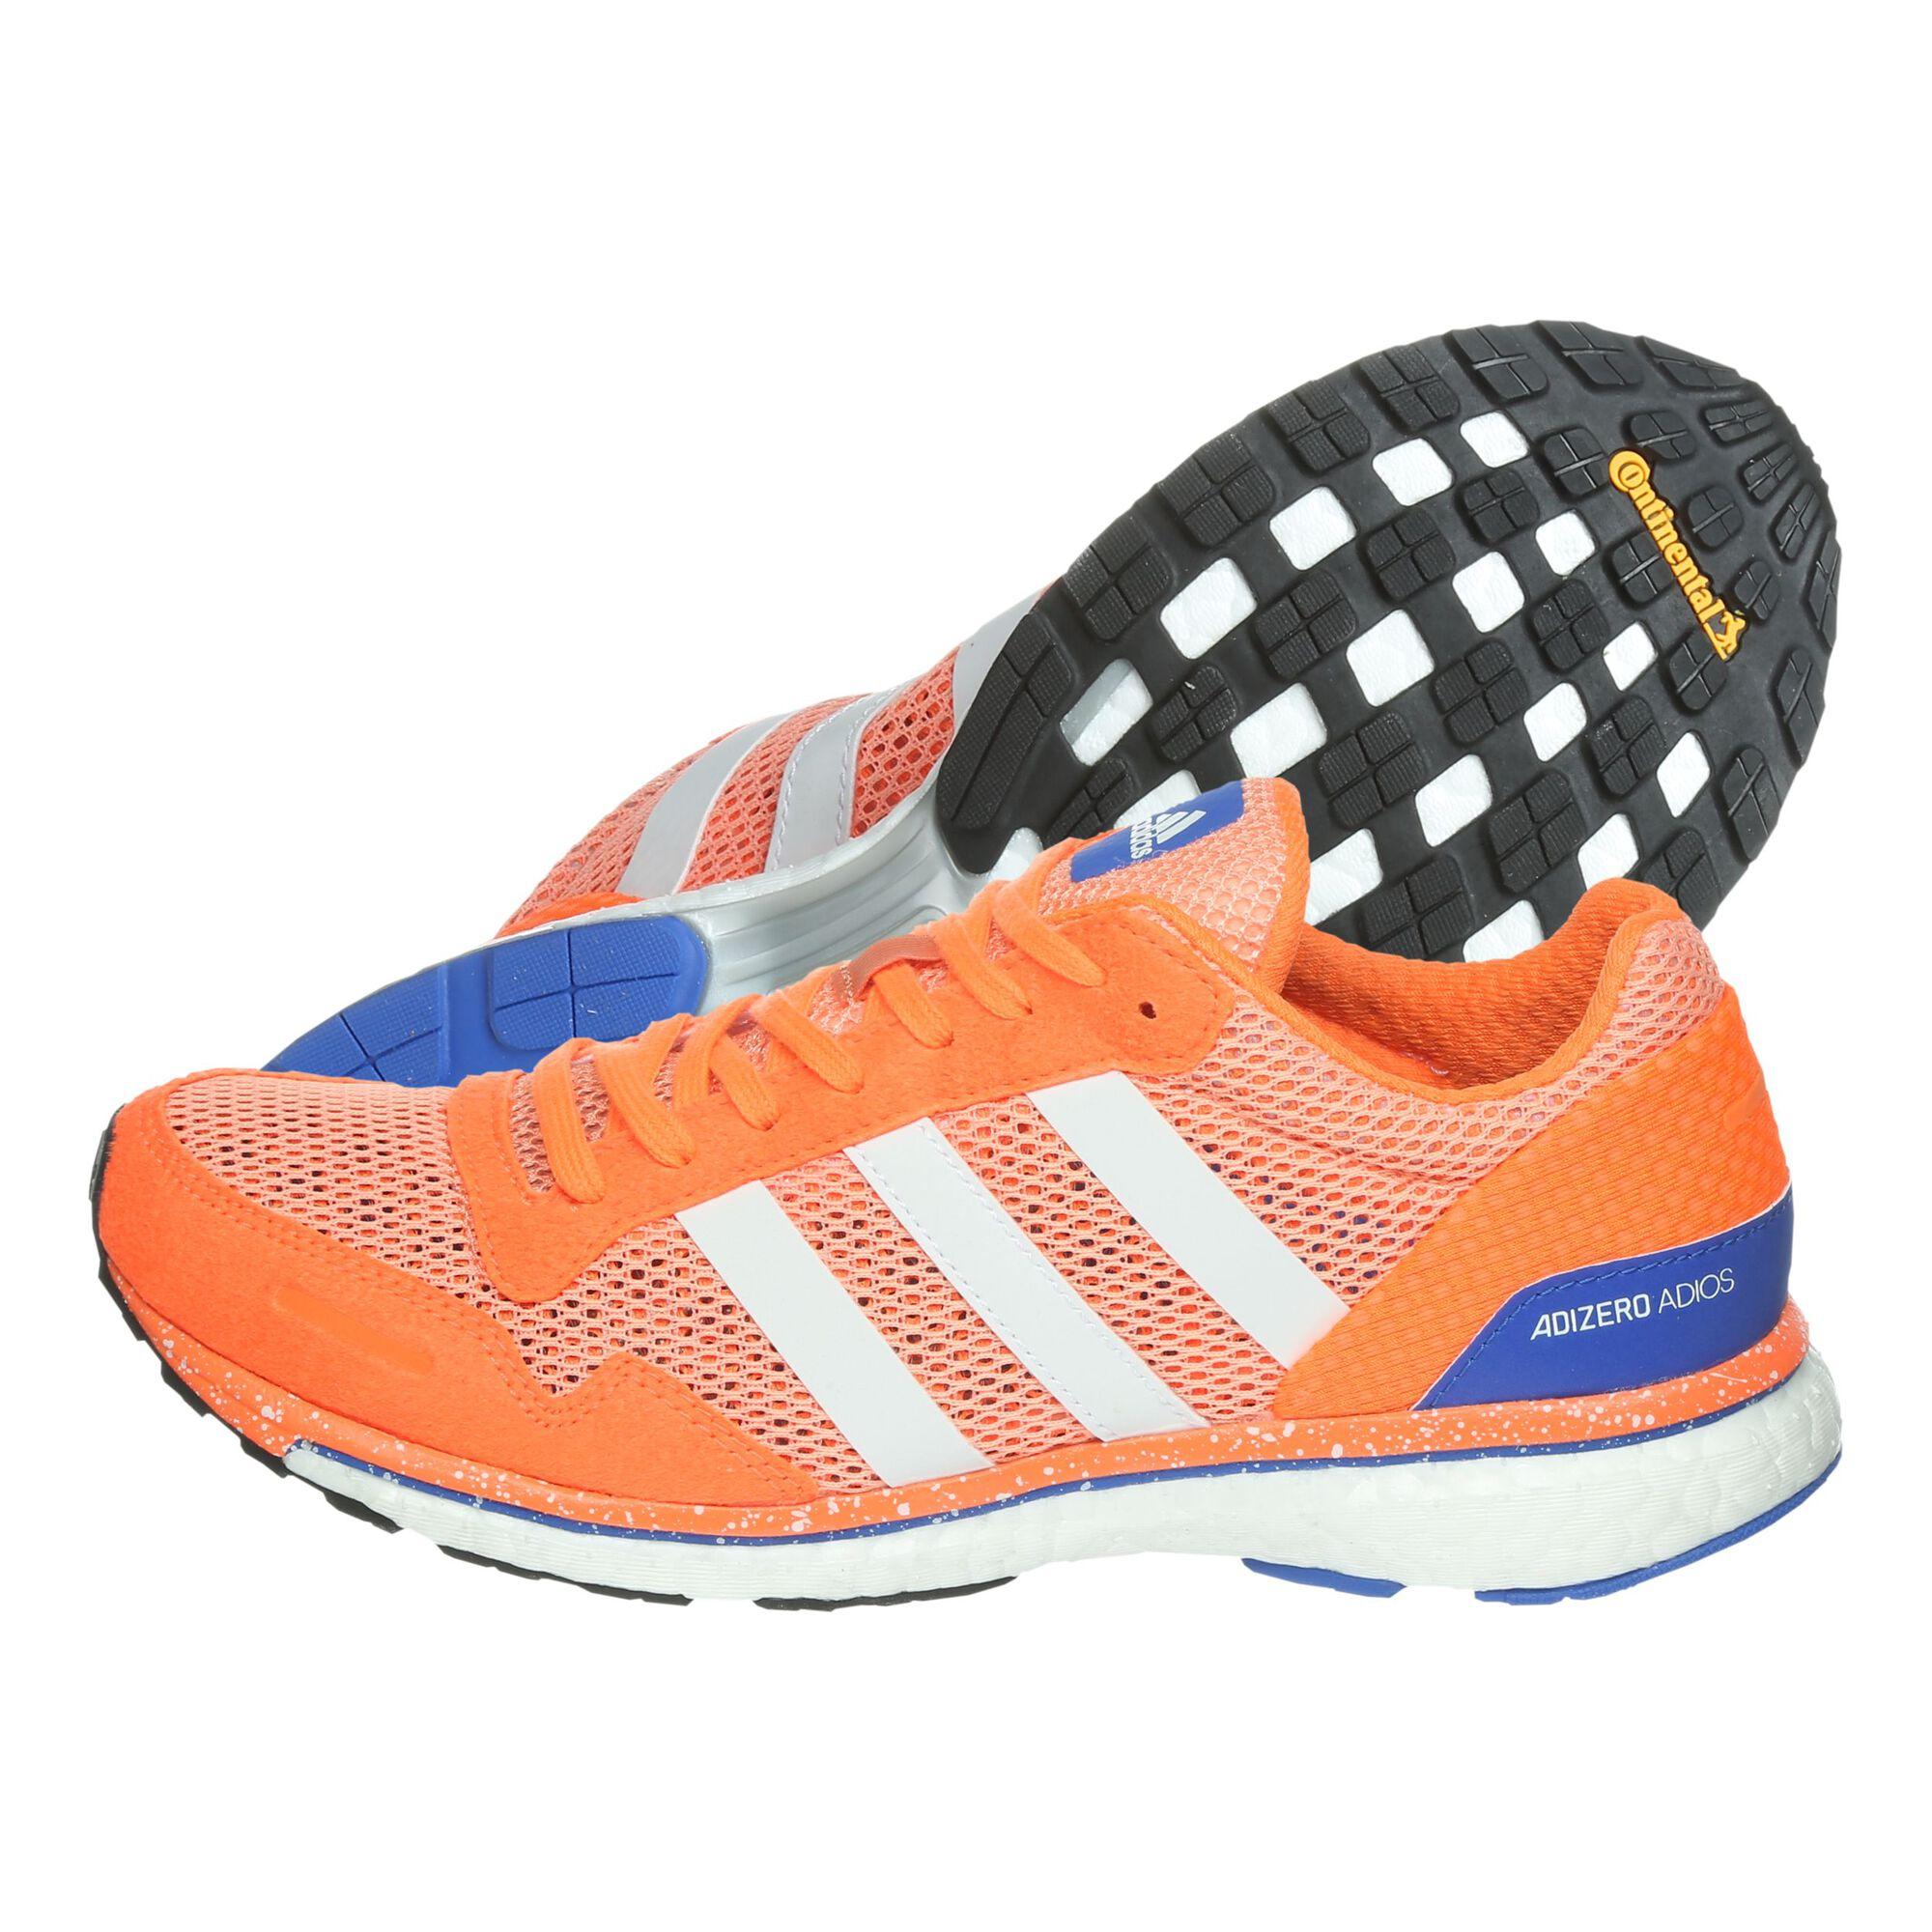 competitive price 305ef 53009 adidas · adidas · adidas · adidas · adidas ...